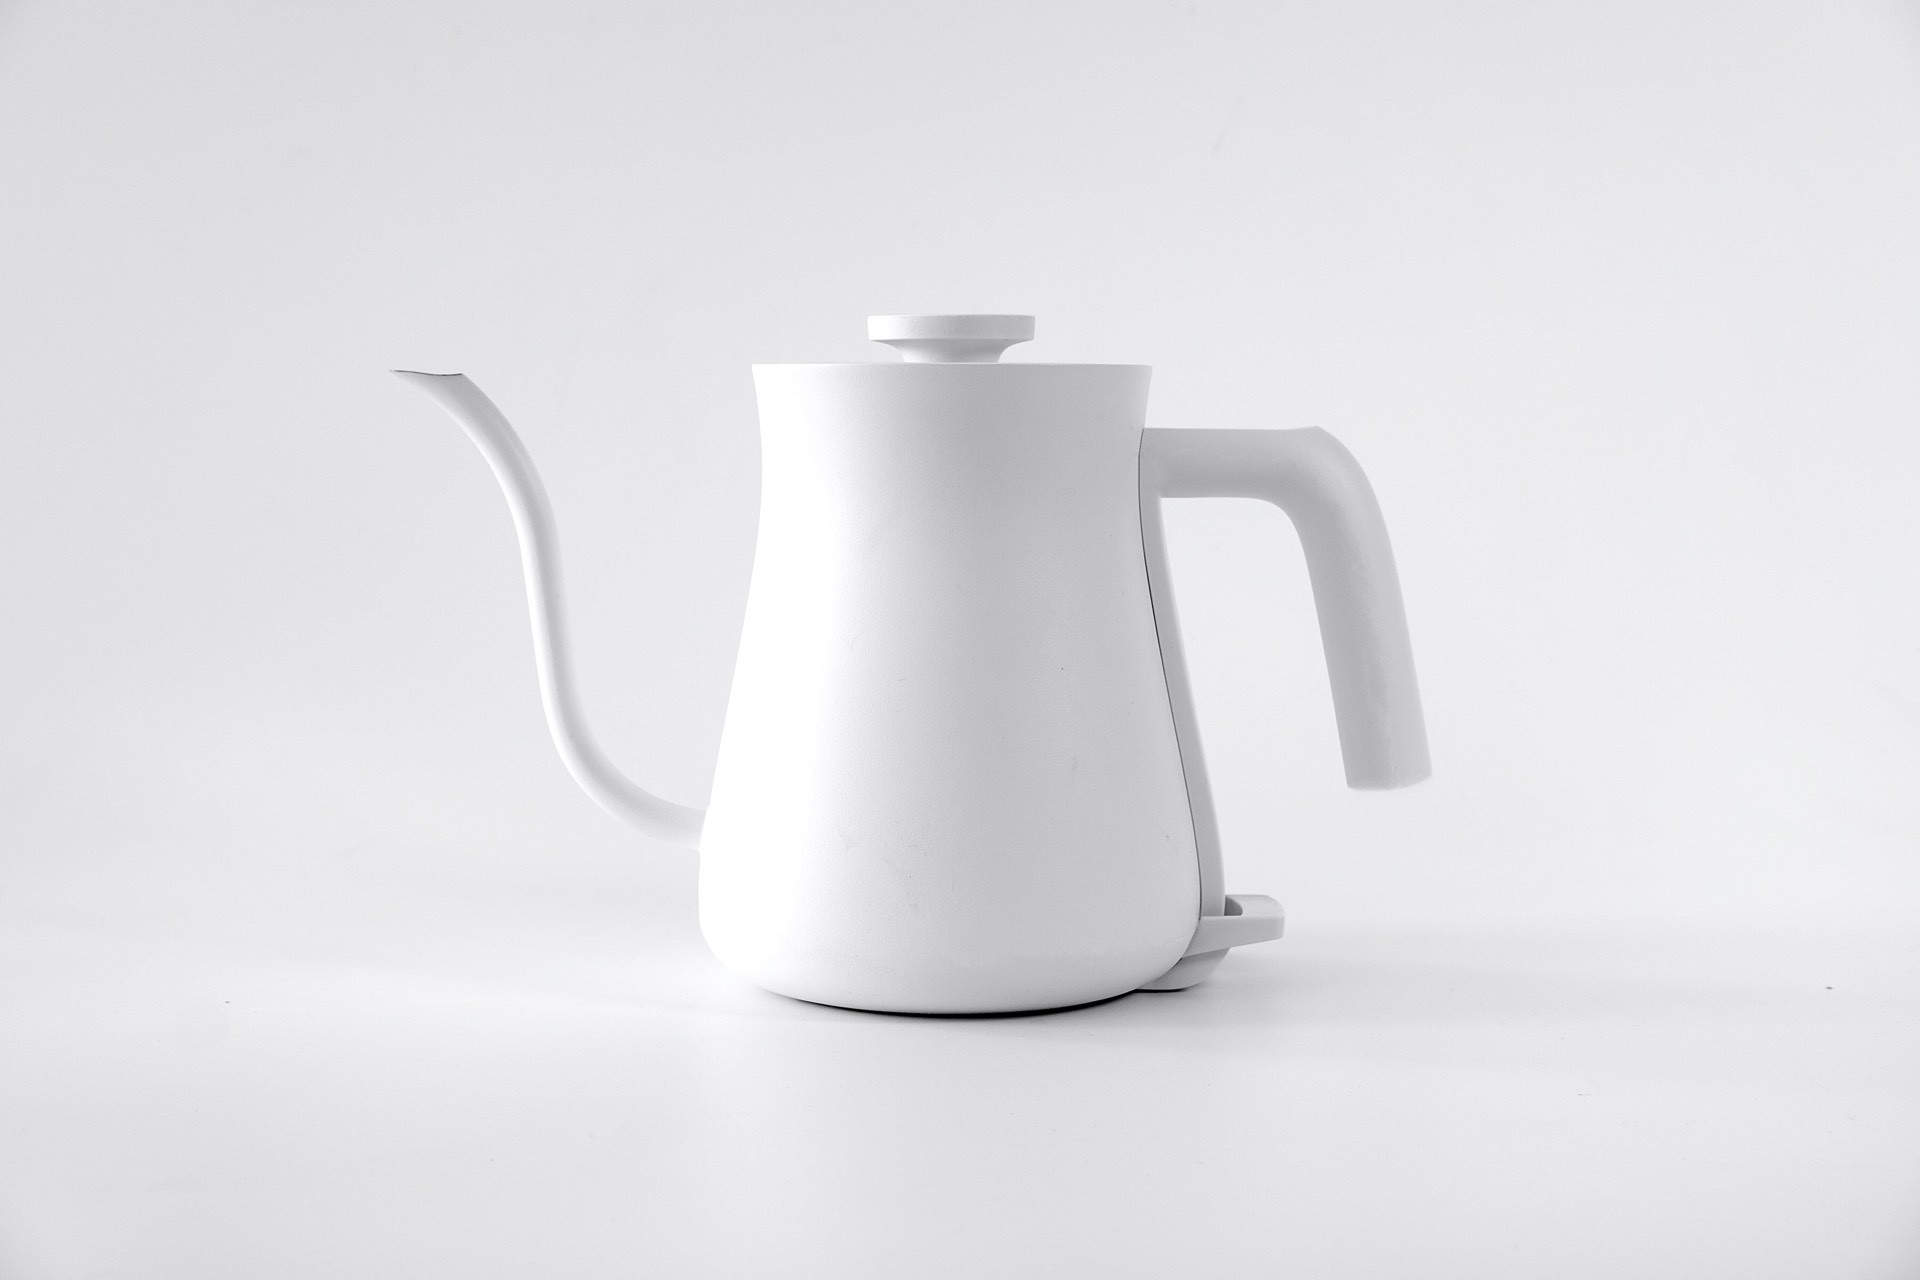 bright-white-coffee-gear-guide-hero-an-vision-studio